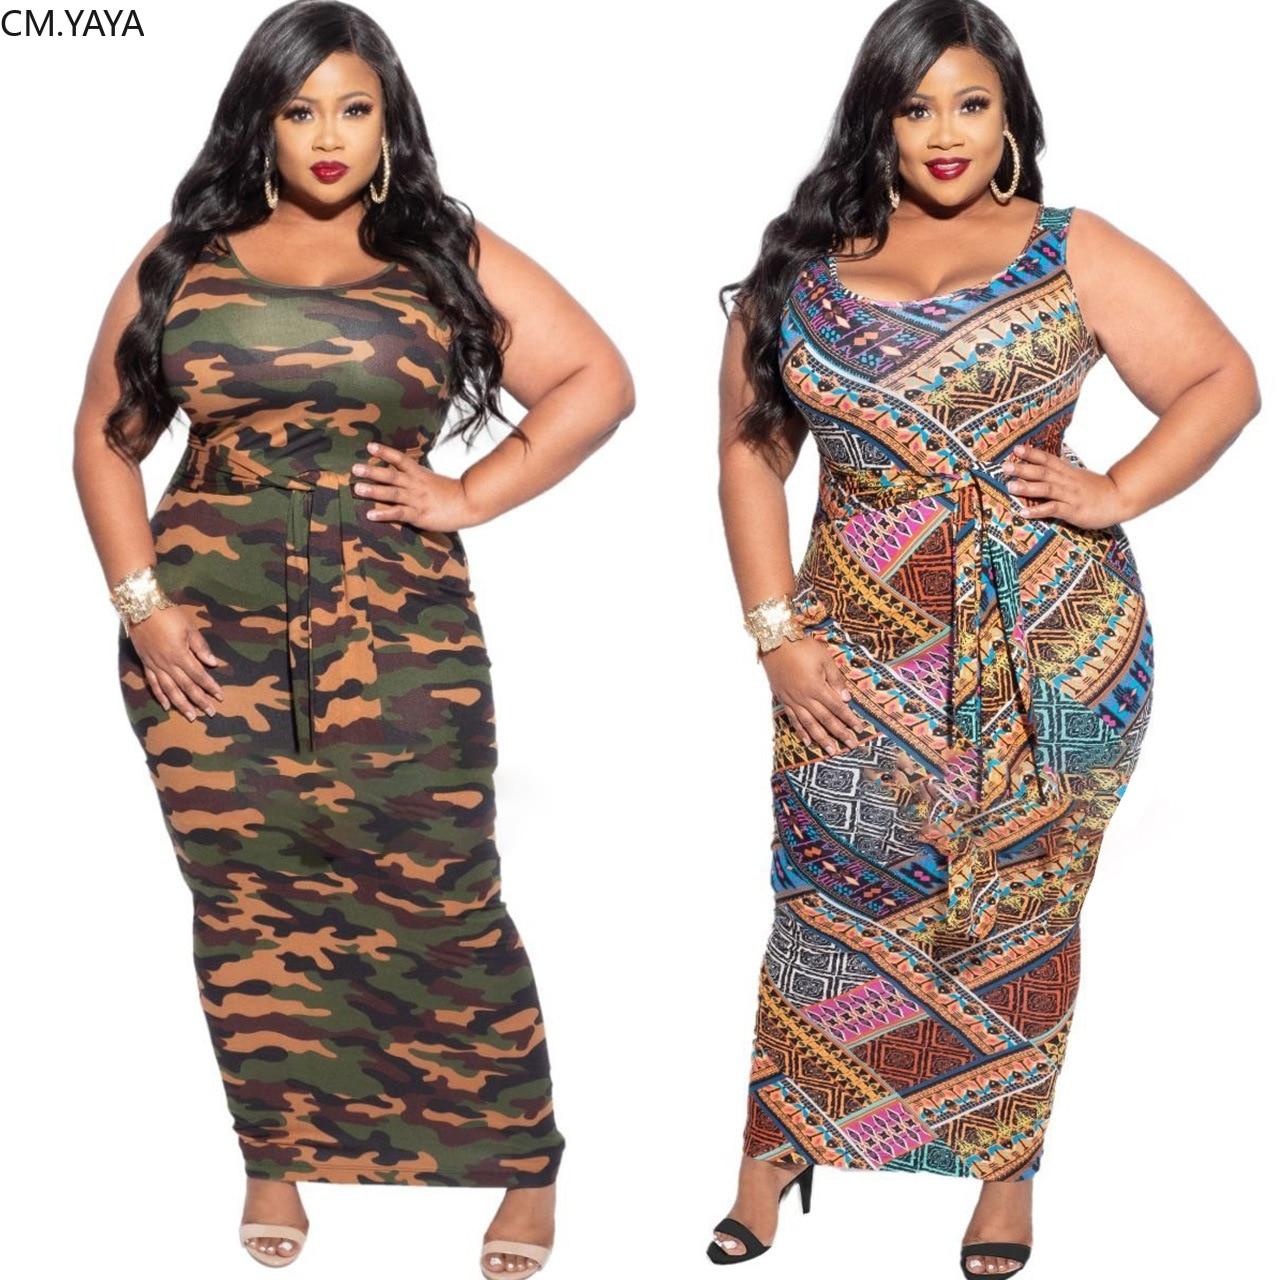 CM.YAYA Mulheres Plus Size XL-5XL Camouflage Imprimir Bodycon Midi Maxi Vestido Sem Mangas Com Faixas Sem Mangas O Pescoço Streetwear